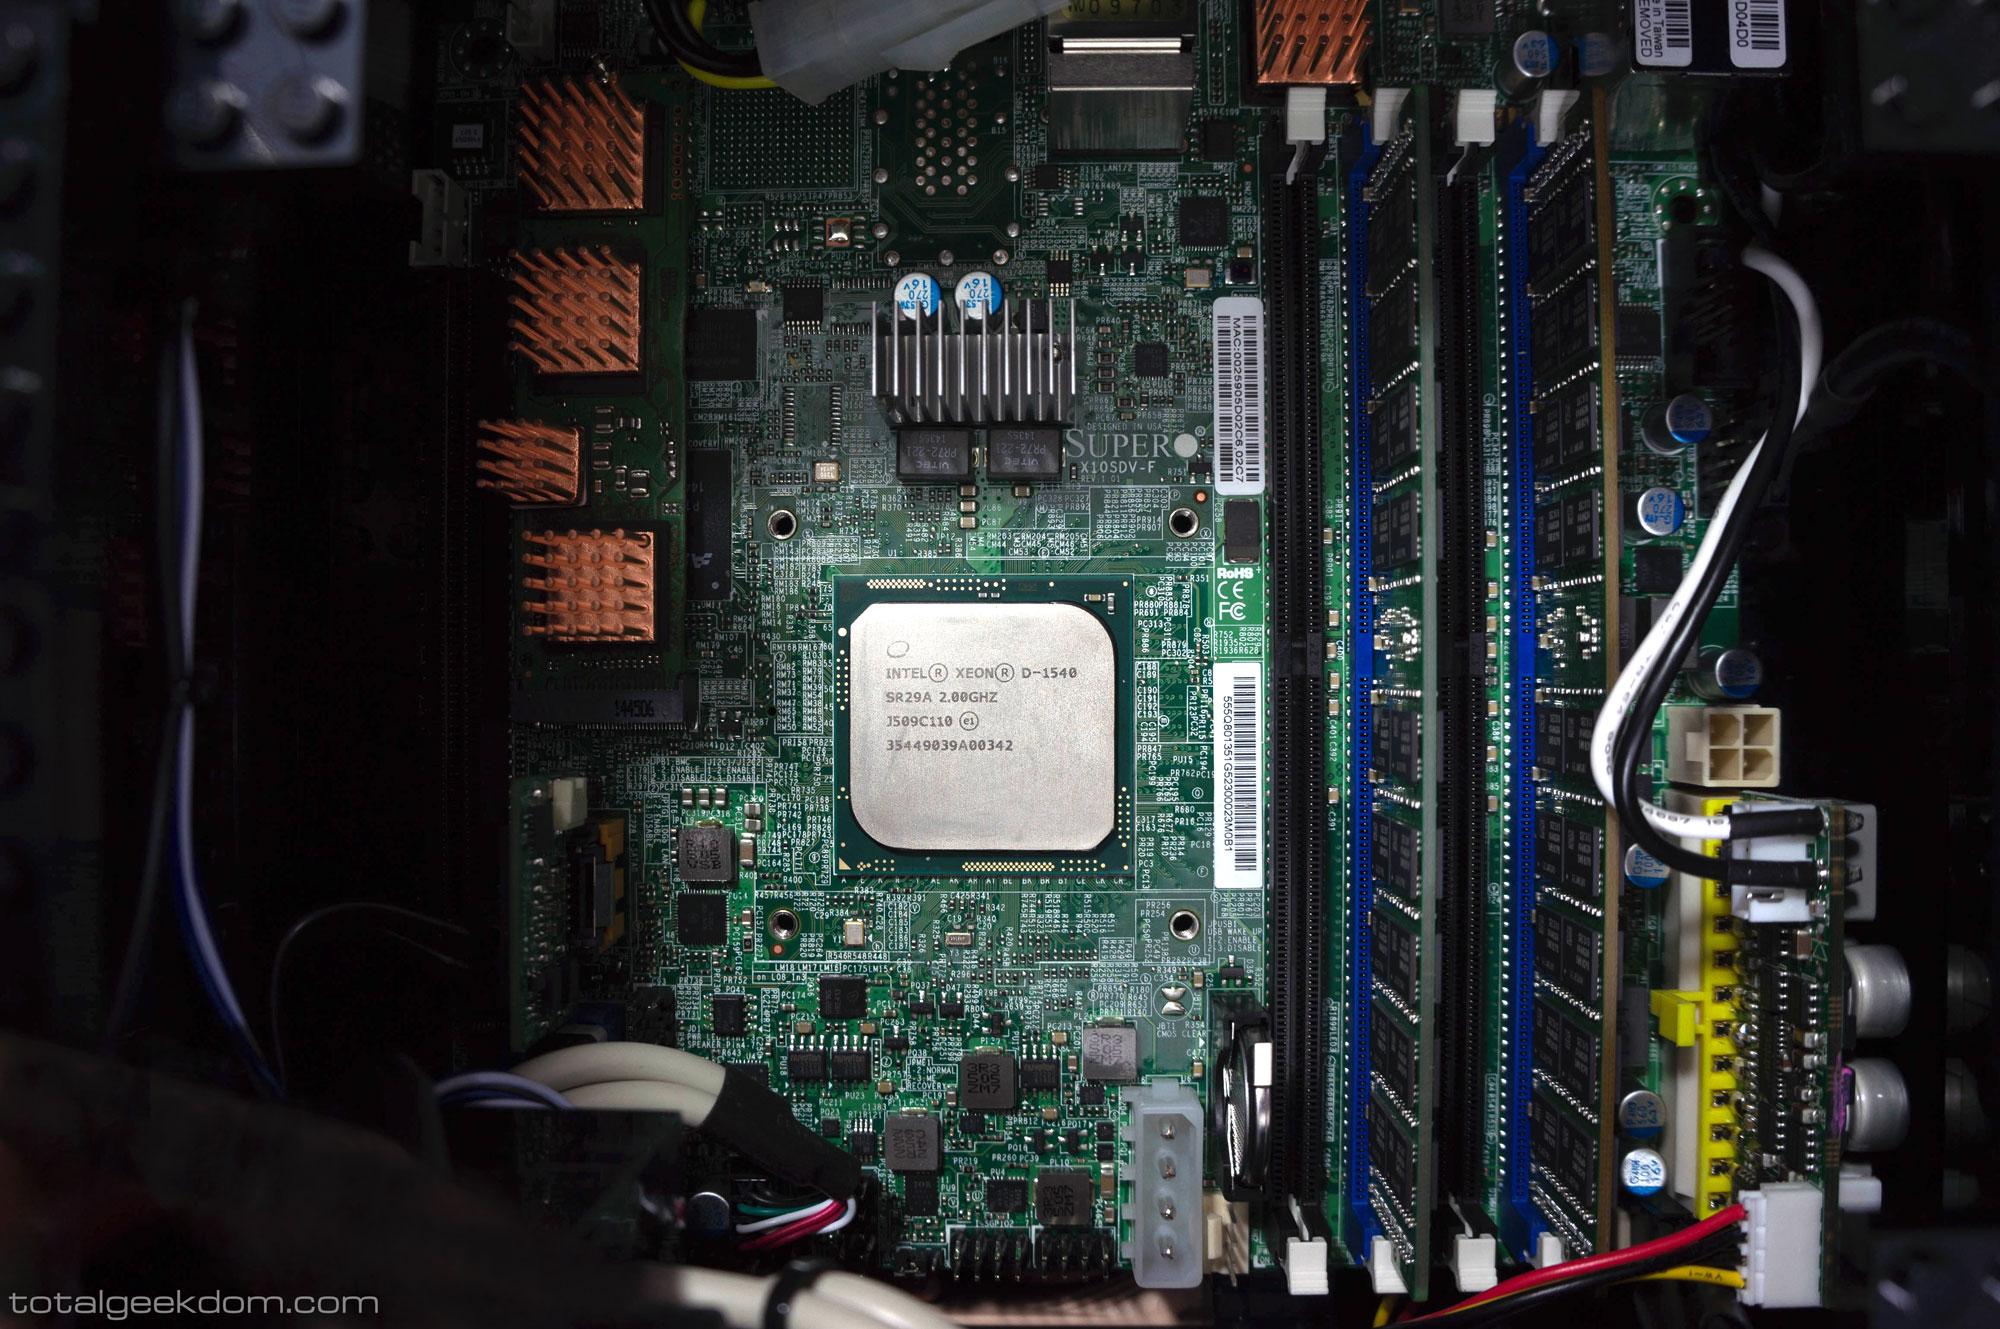 Xeon D-1540